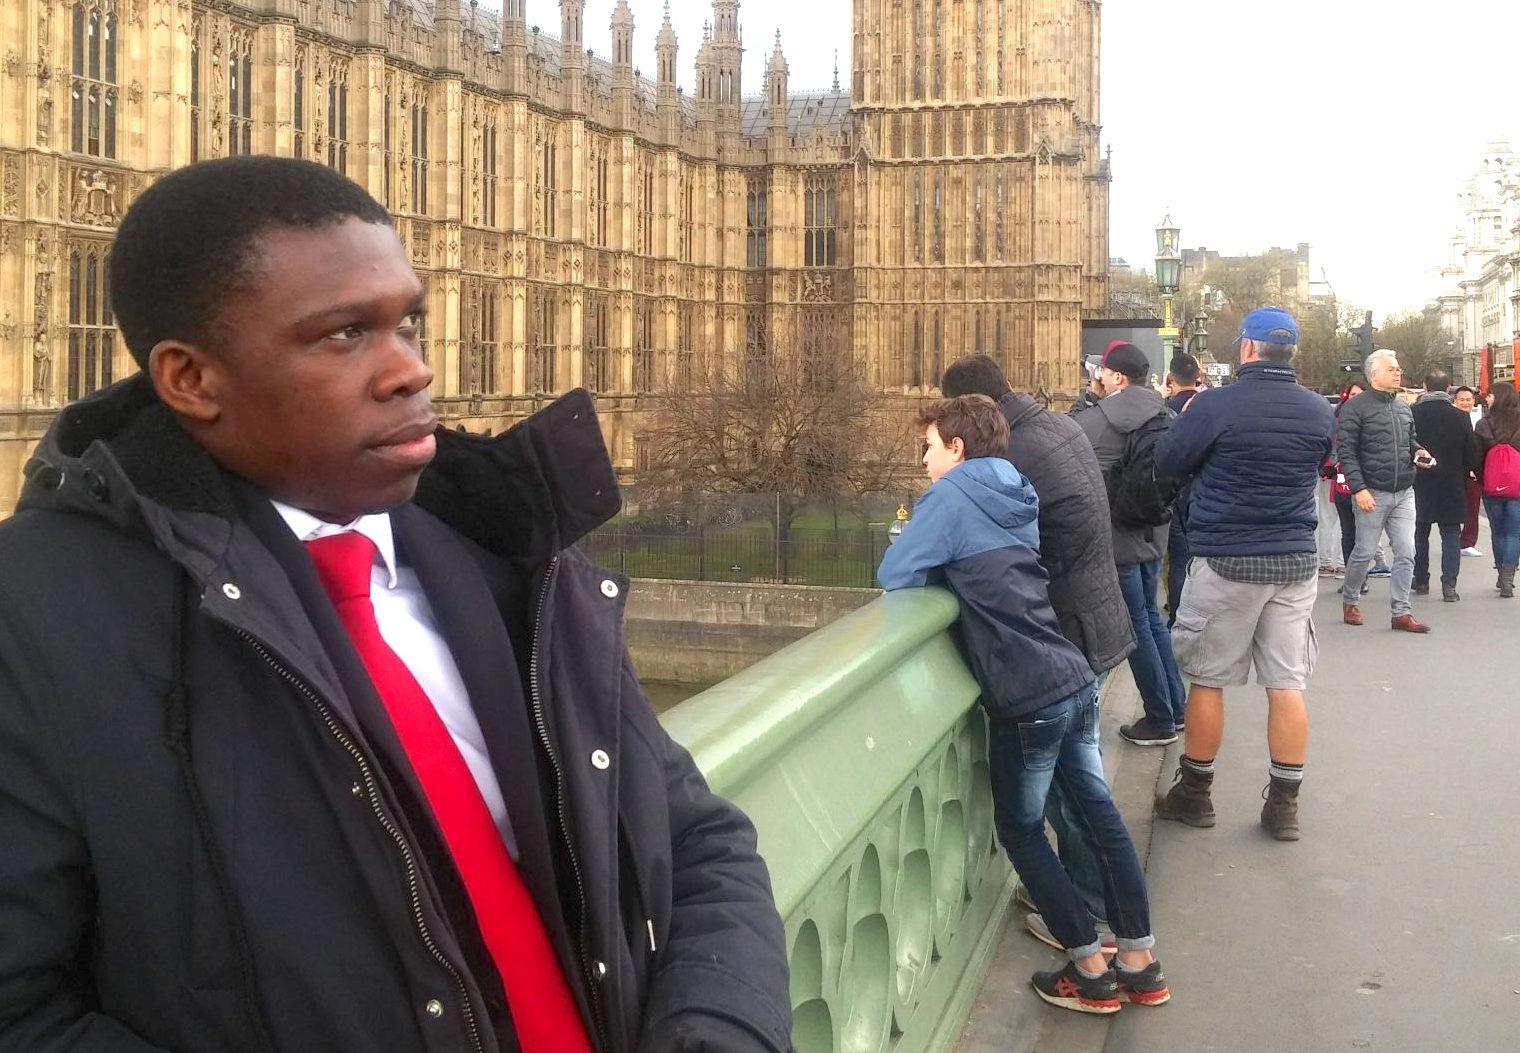 George stood in front of Big Ben